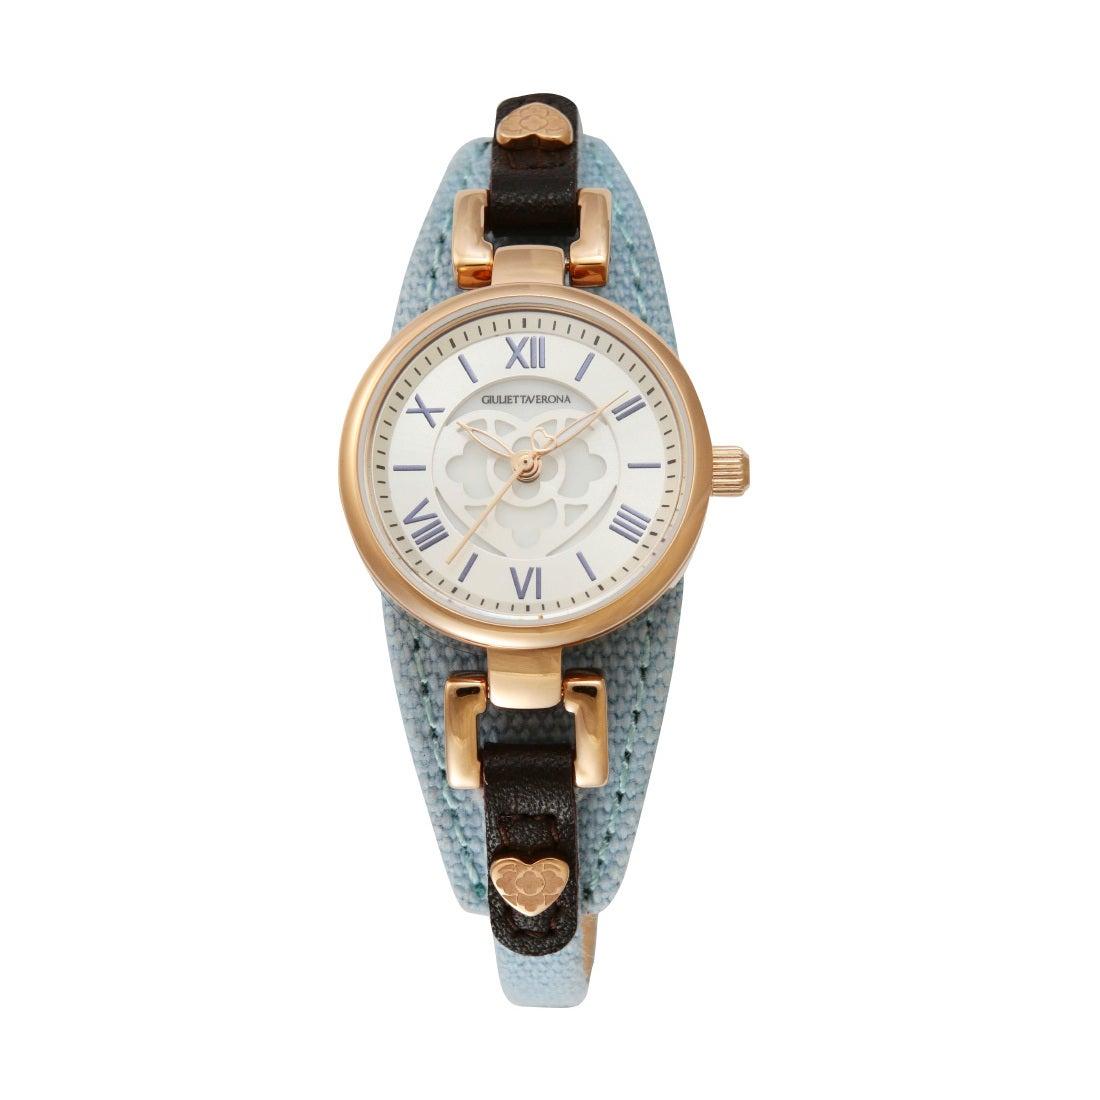 【SAC'S BAR】ジュリエッタヴェローナ GIULIETTAVERONA 腕時計 GV005 PRIMA DONNA シルバー×ライトブルー